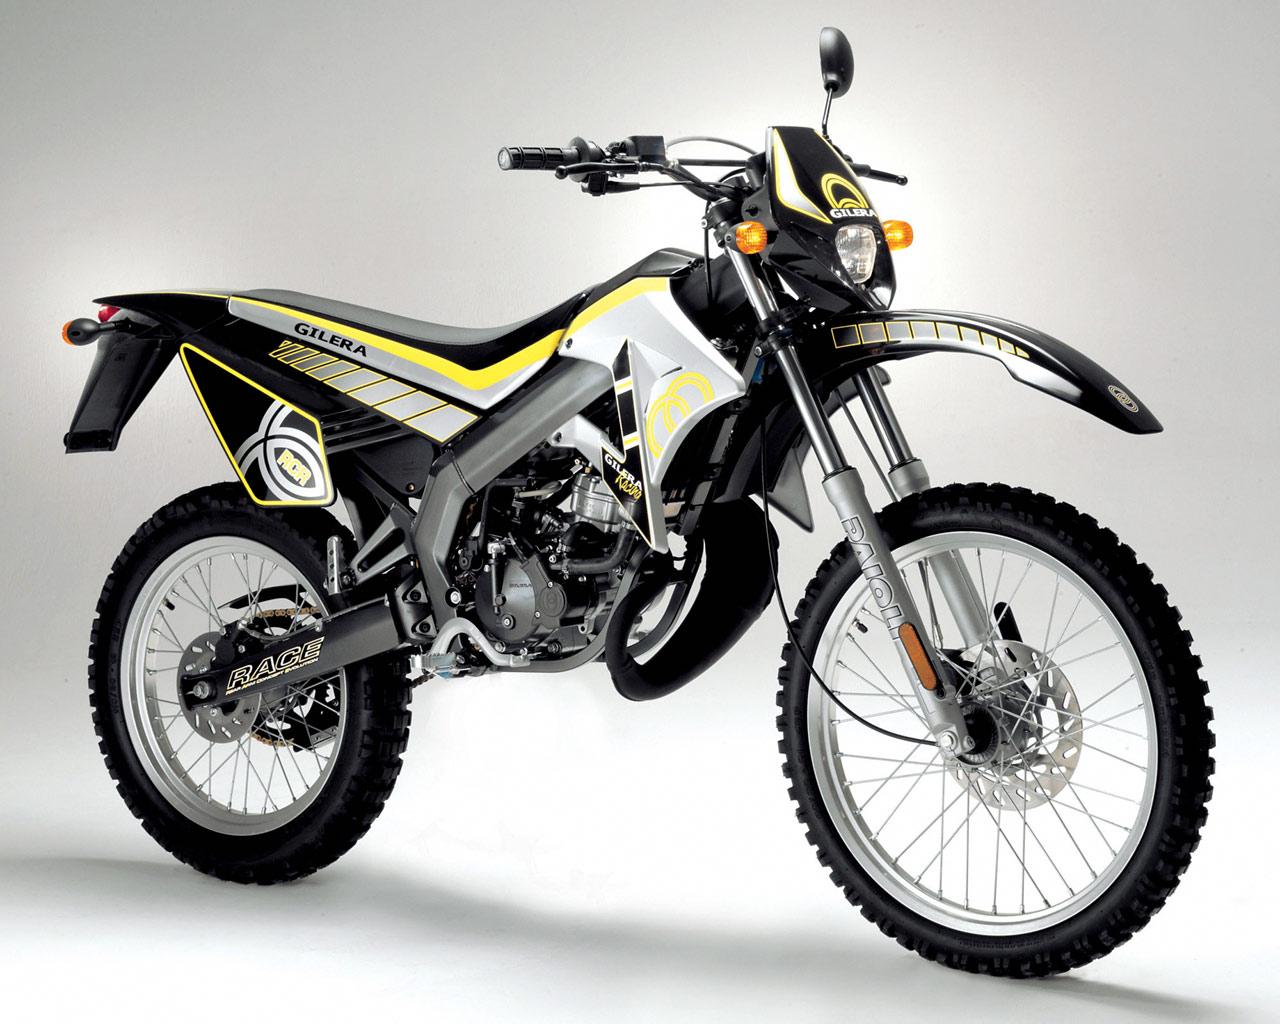 http://2.bp.blogspot.com/-fQmwCneE96Y/TXYVtwZuUUI/AAAAAAAAJm0/oxW6oc2q3UY/s1600/Gilera_RCR_50_Offroad_Bike.jpg